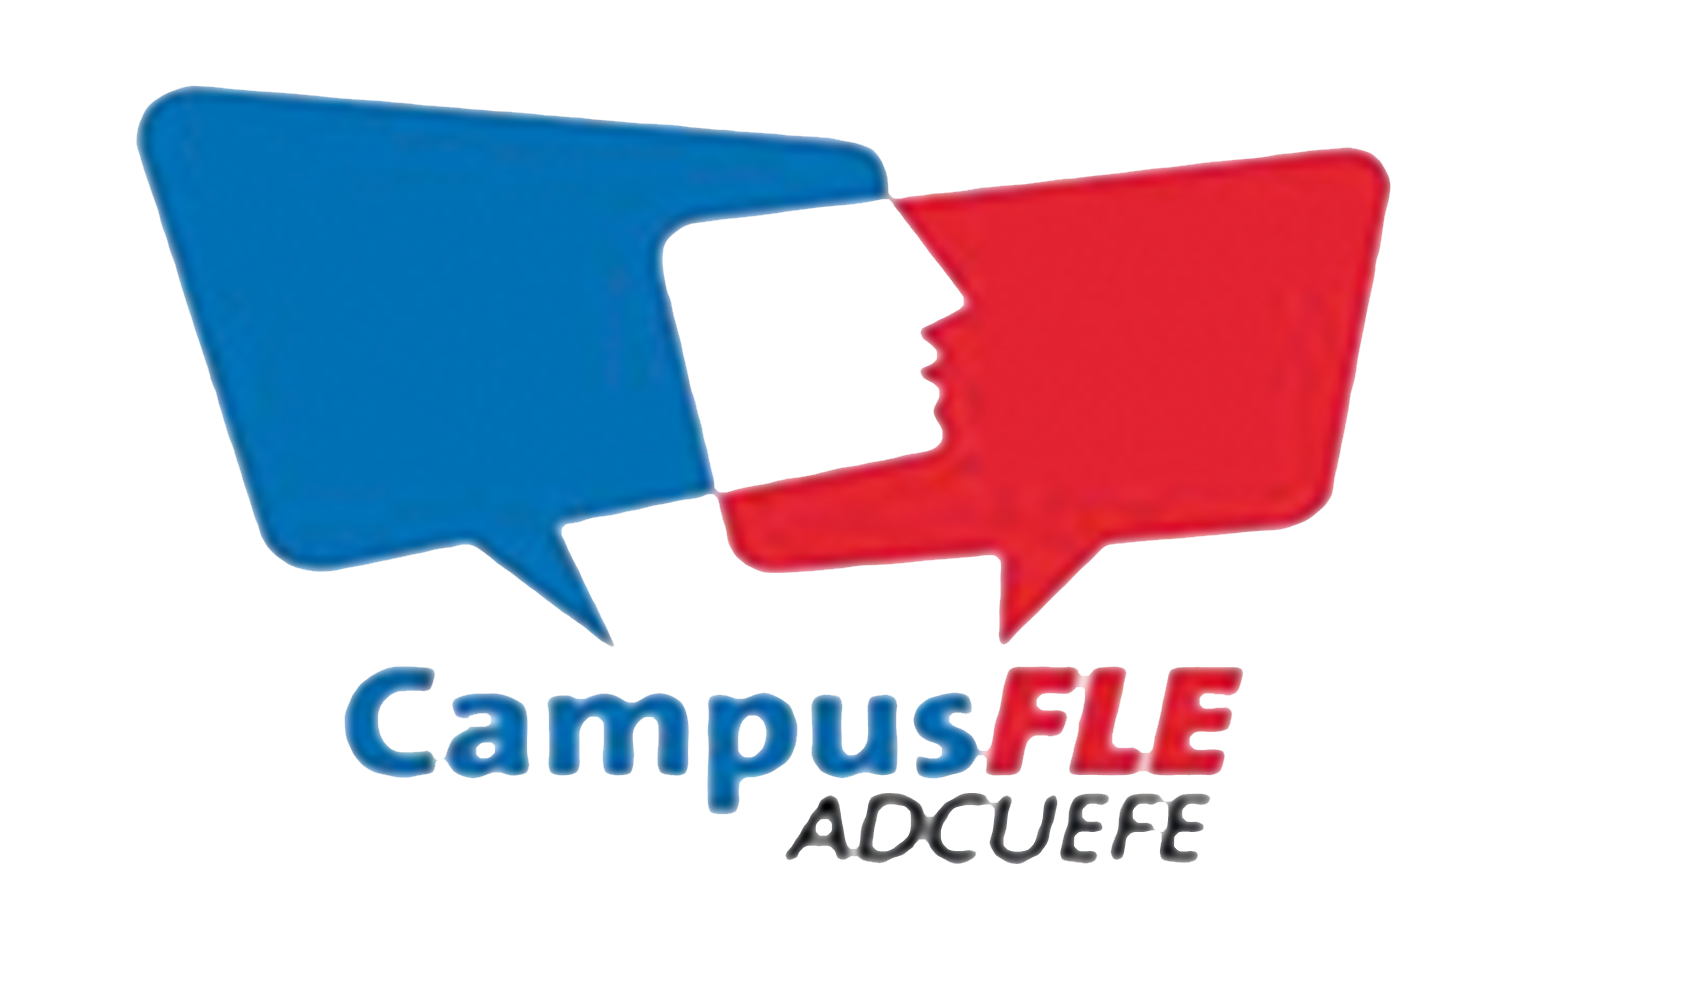 CampusFle ADCUEFE